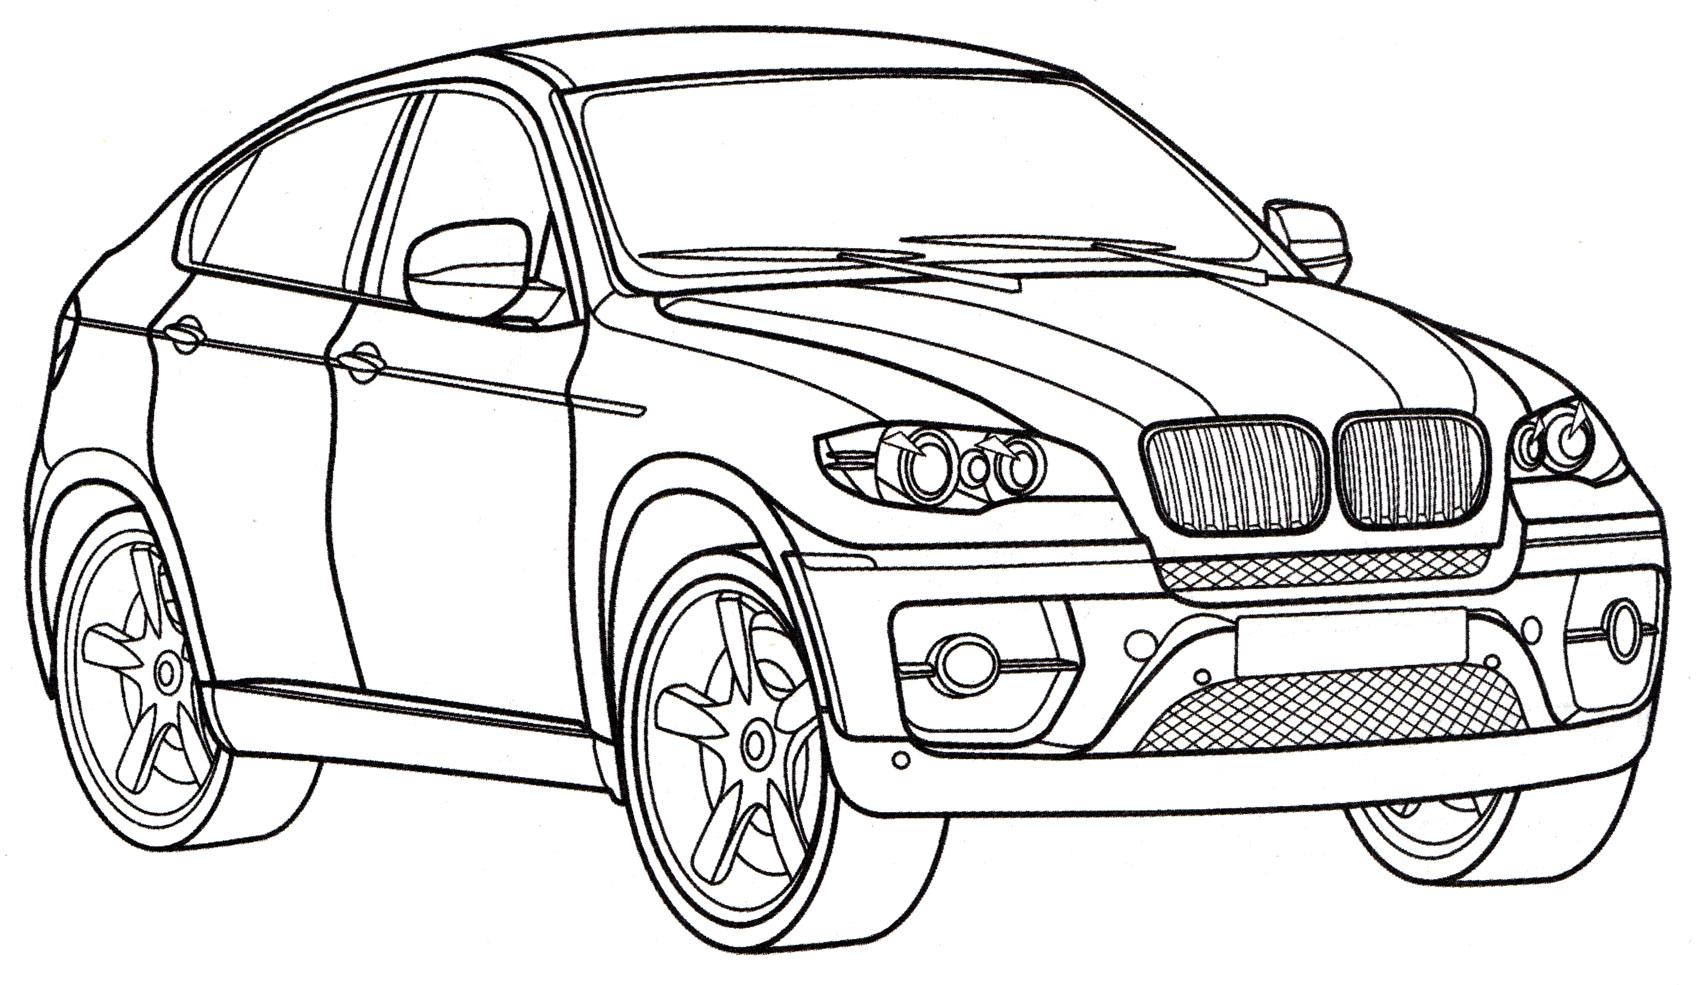 Раскраска БМВ X6